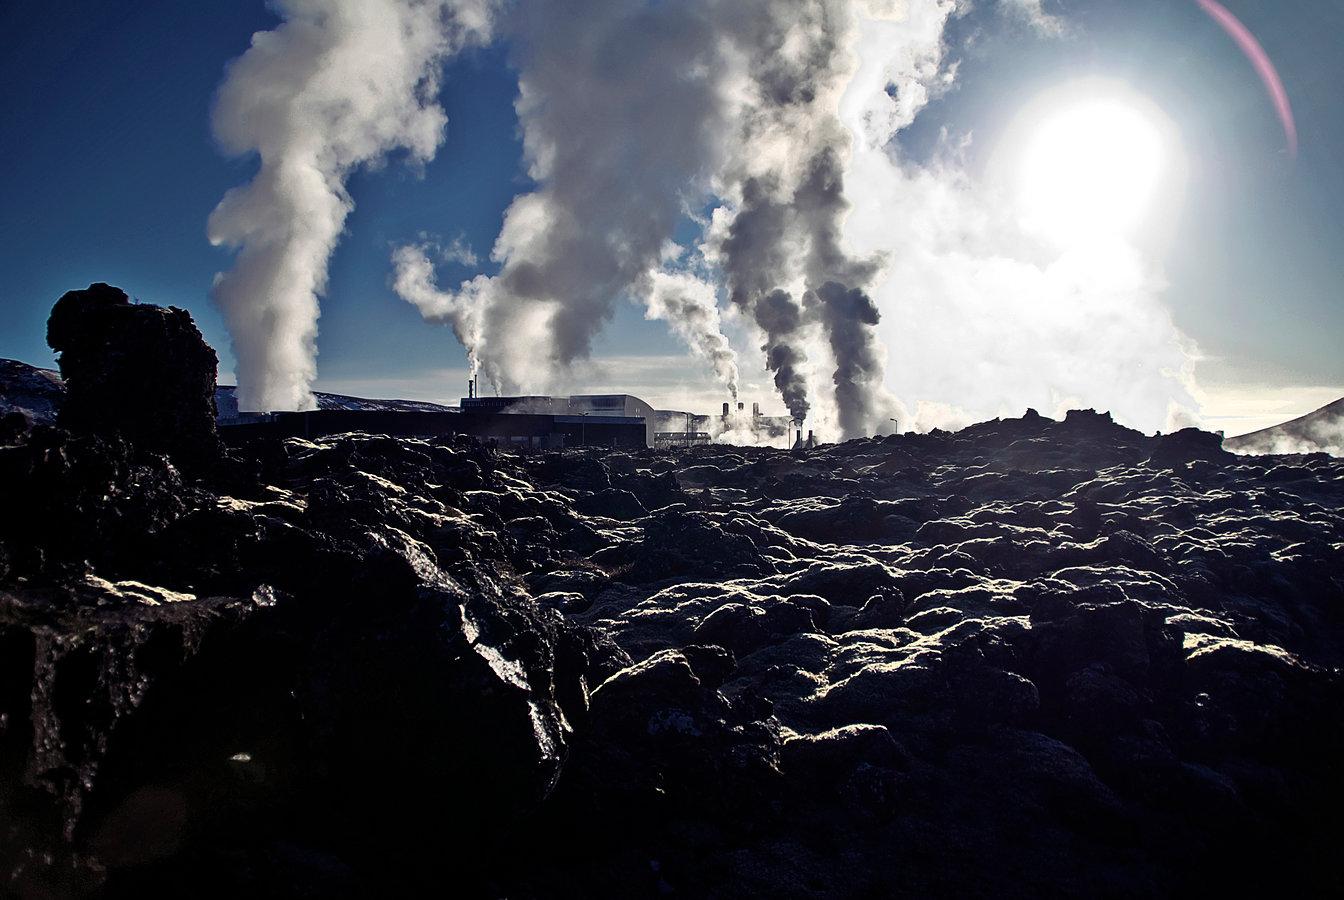 Keflavík - Iceland